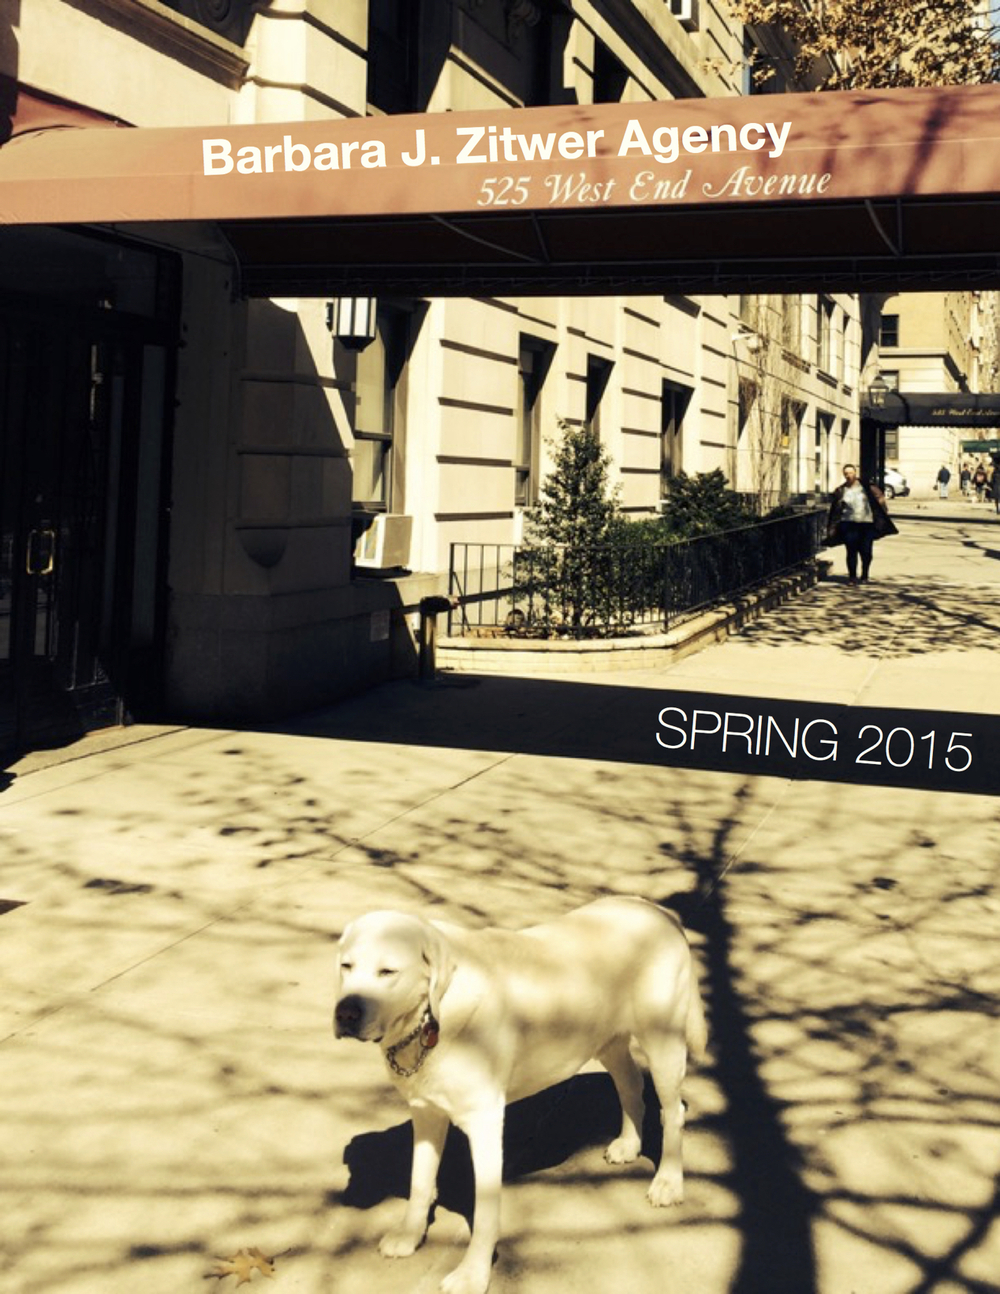 spring cover postcard.jpg